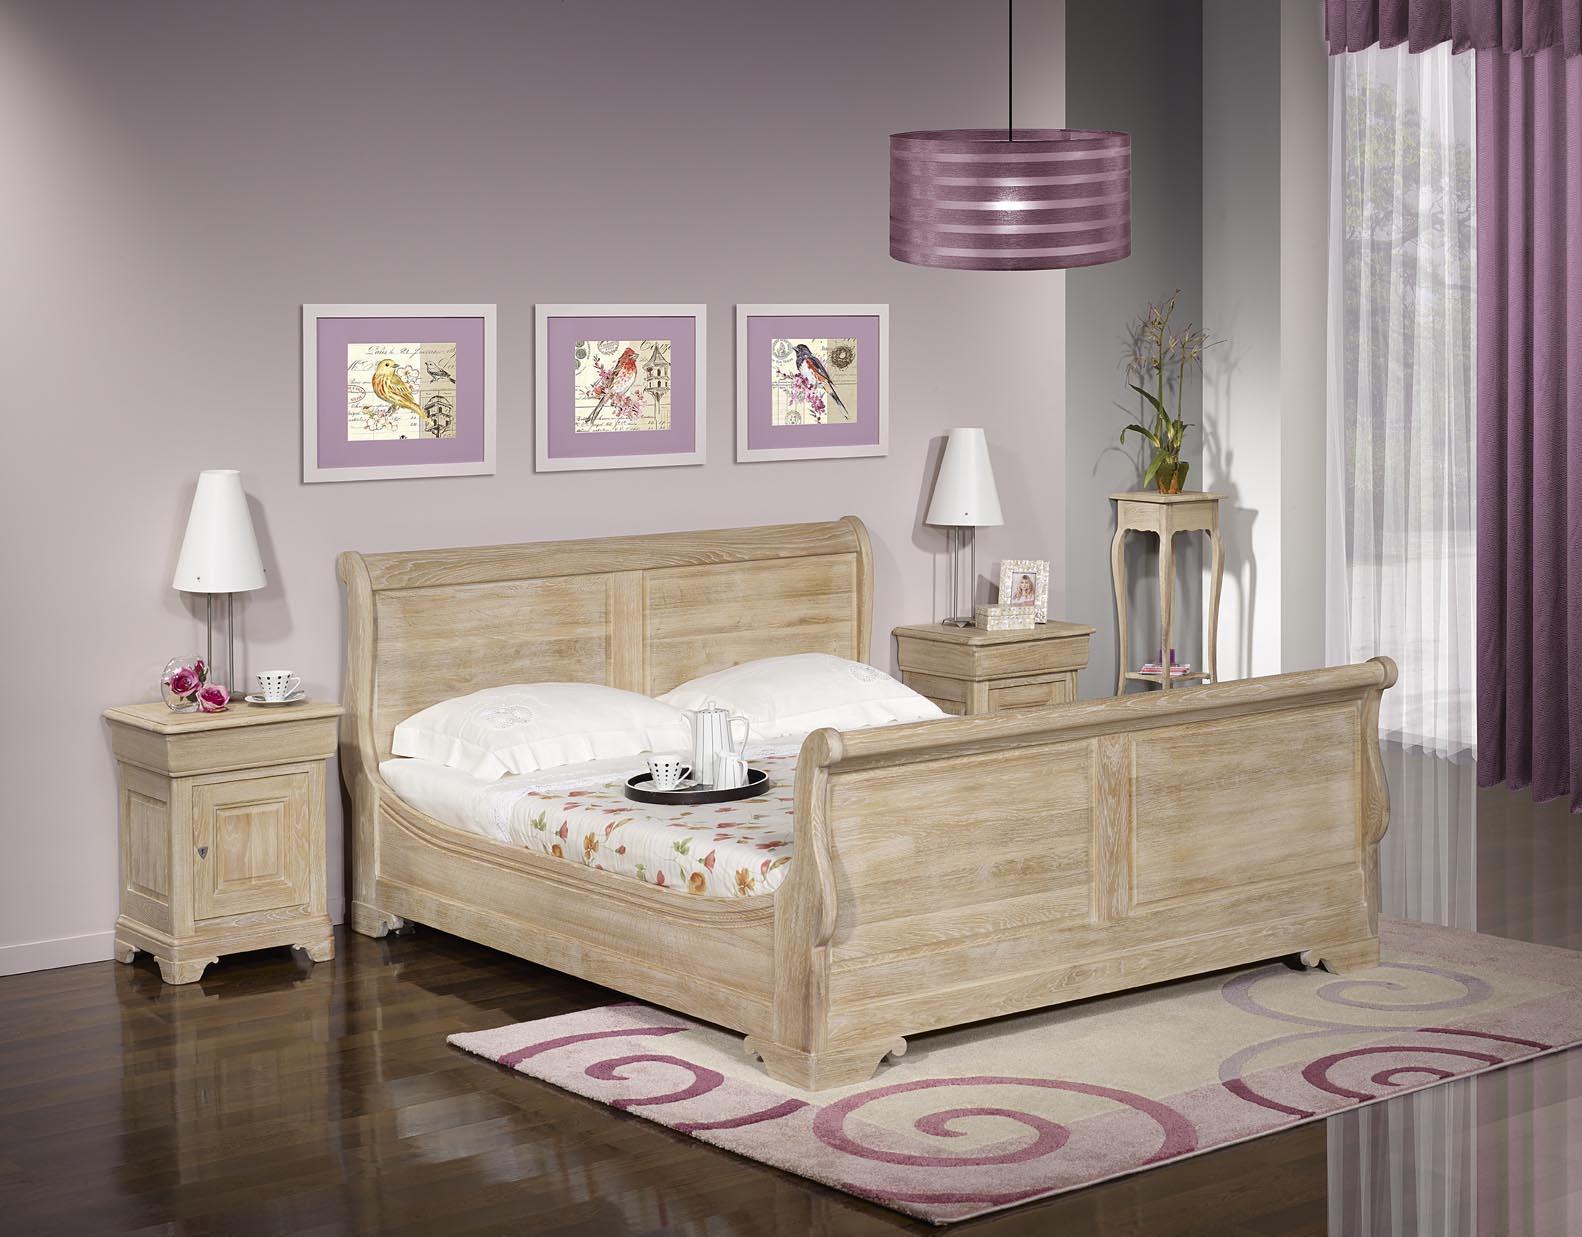 lit bateau martin en ch ne massif 140 190 de style louis philippe finition ch ne bross blanchi. Black Bedroom Furniture Sets. Home Design Ideas